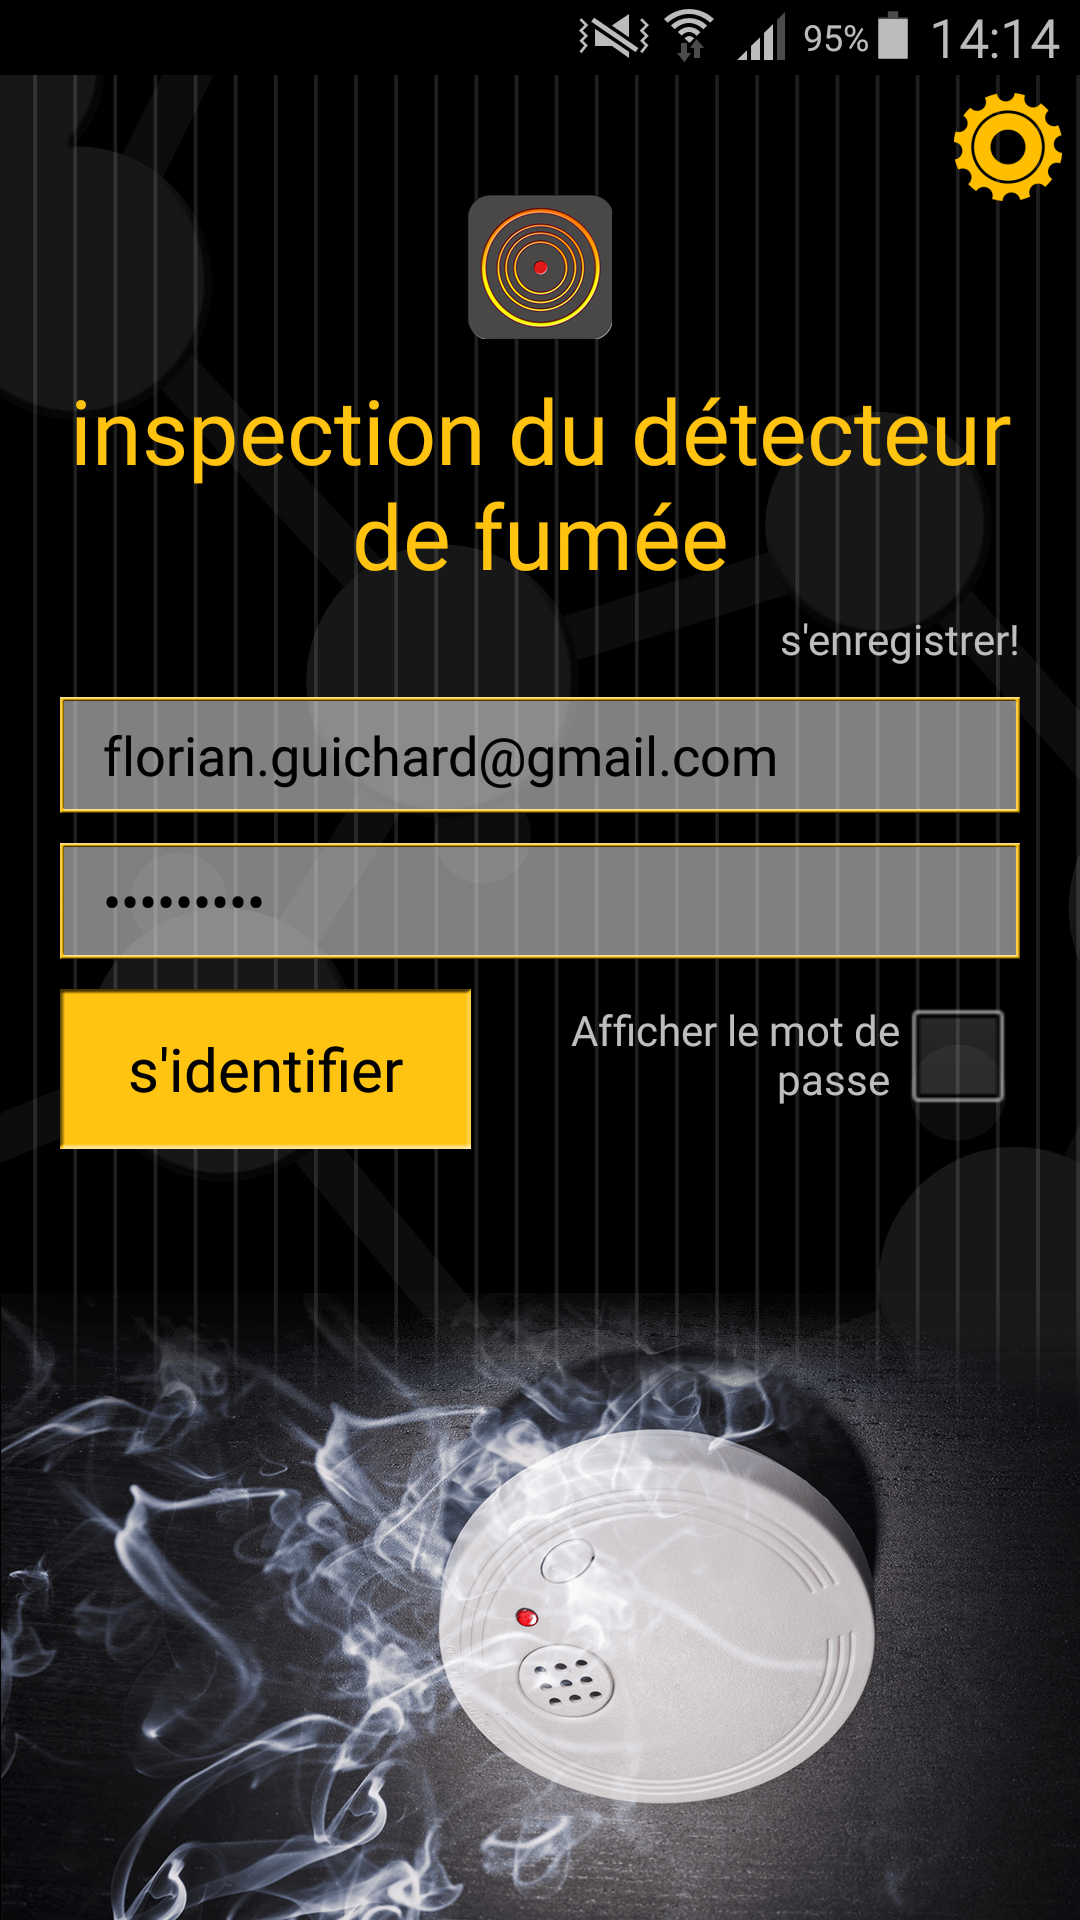 ginstr_app_smokeDetectorInspection_FR_1